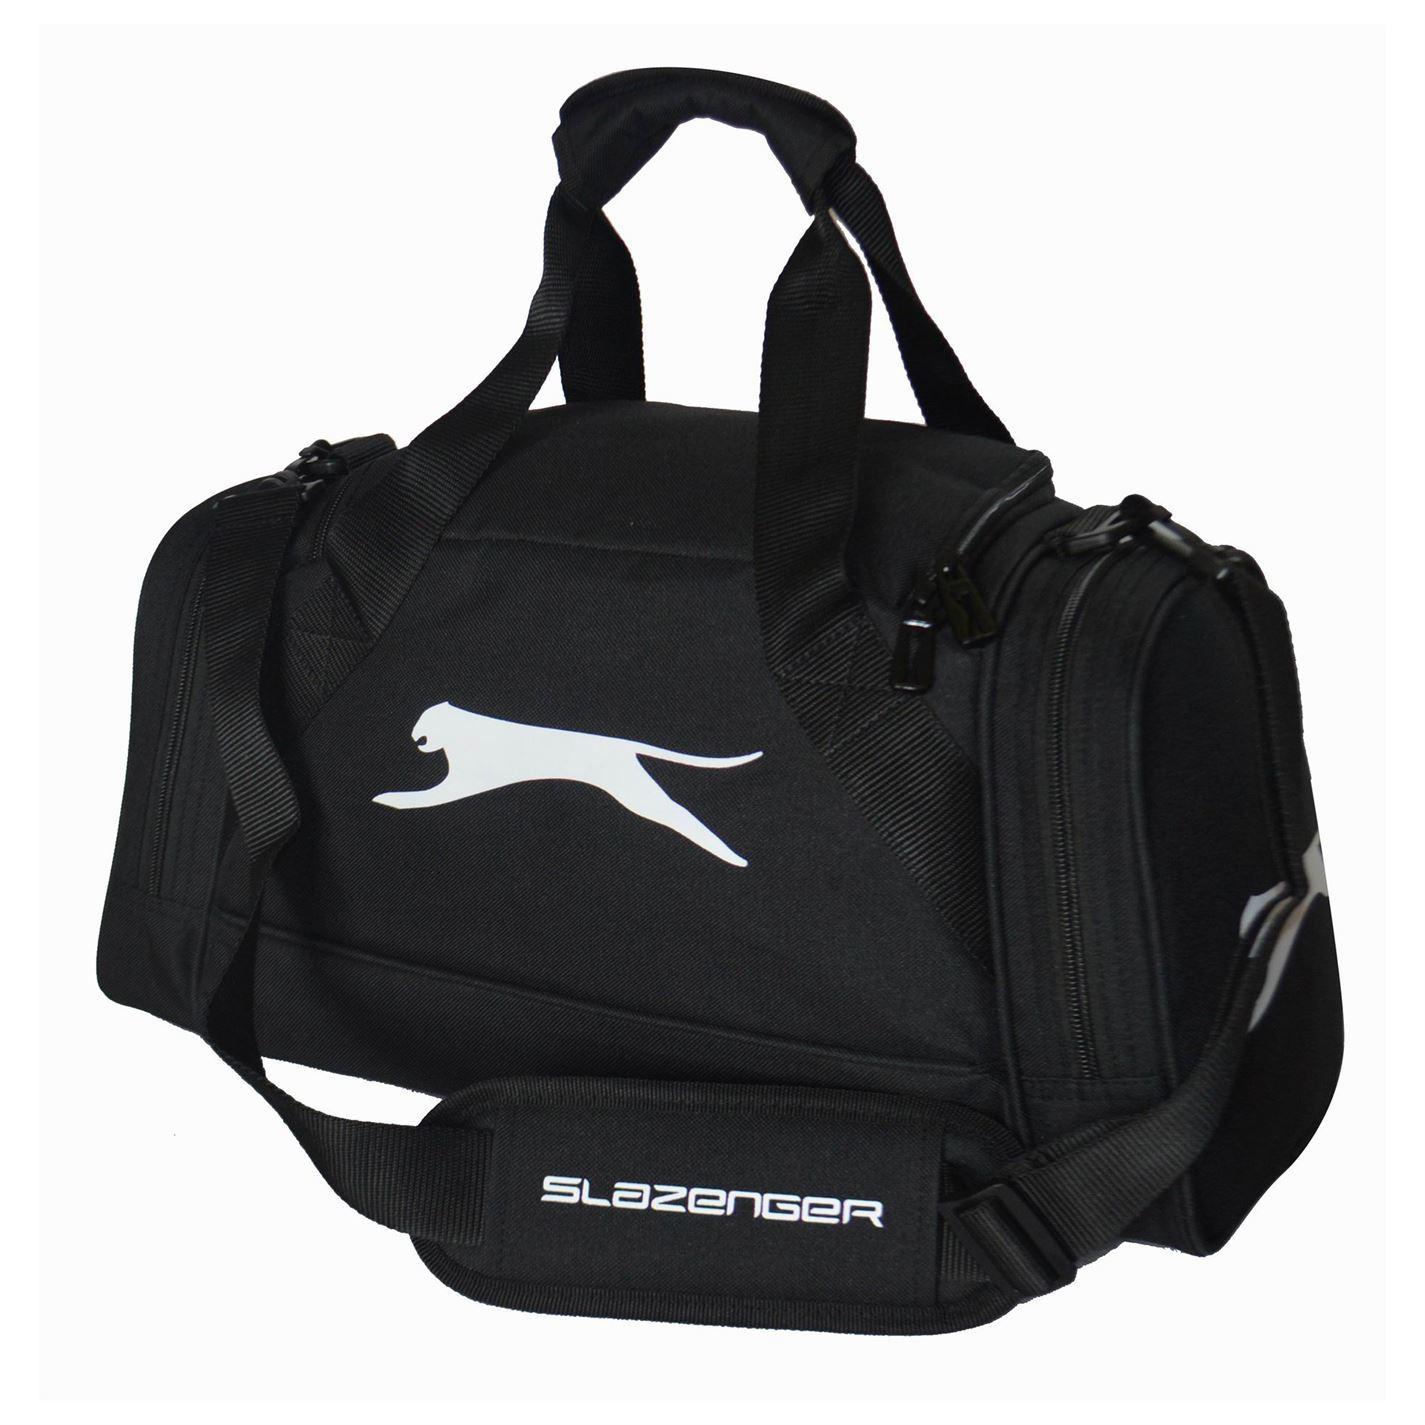 Slazenger Extra Small Holdall Black Sports Bag Gymbag Carryall